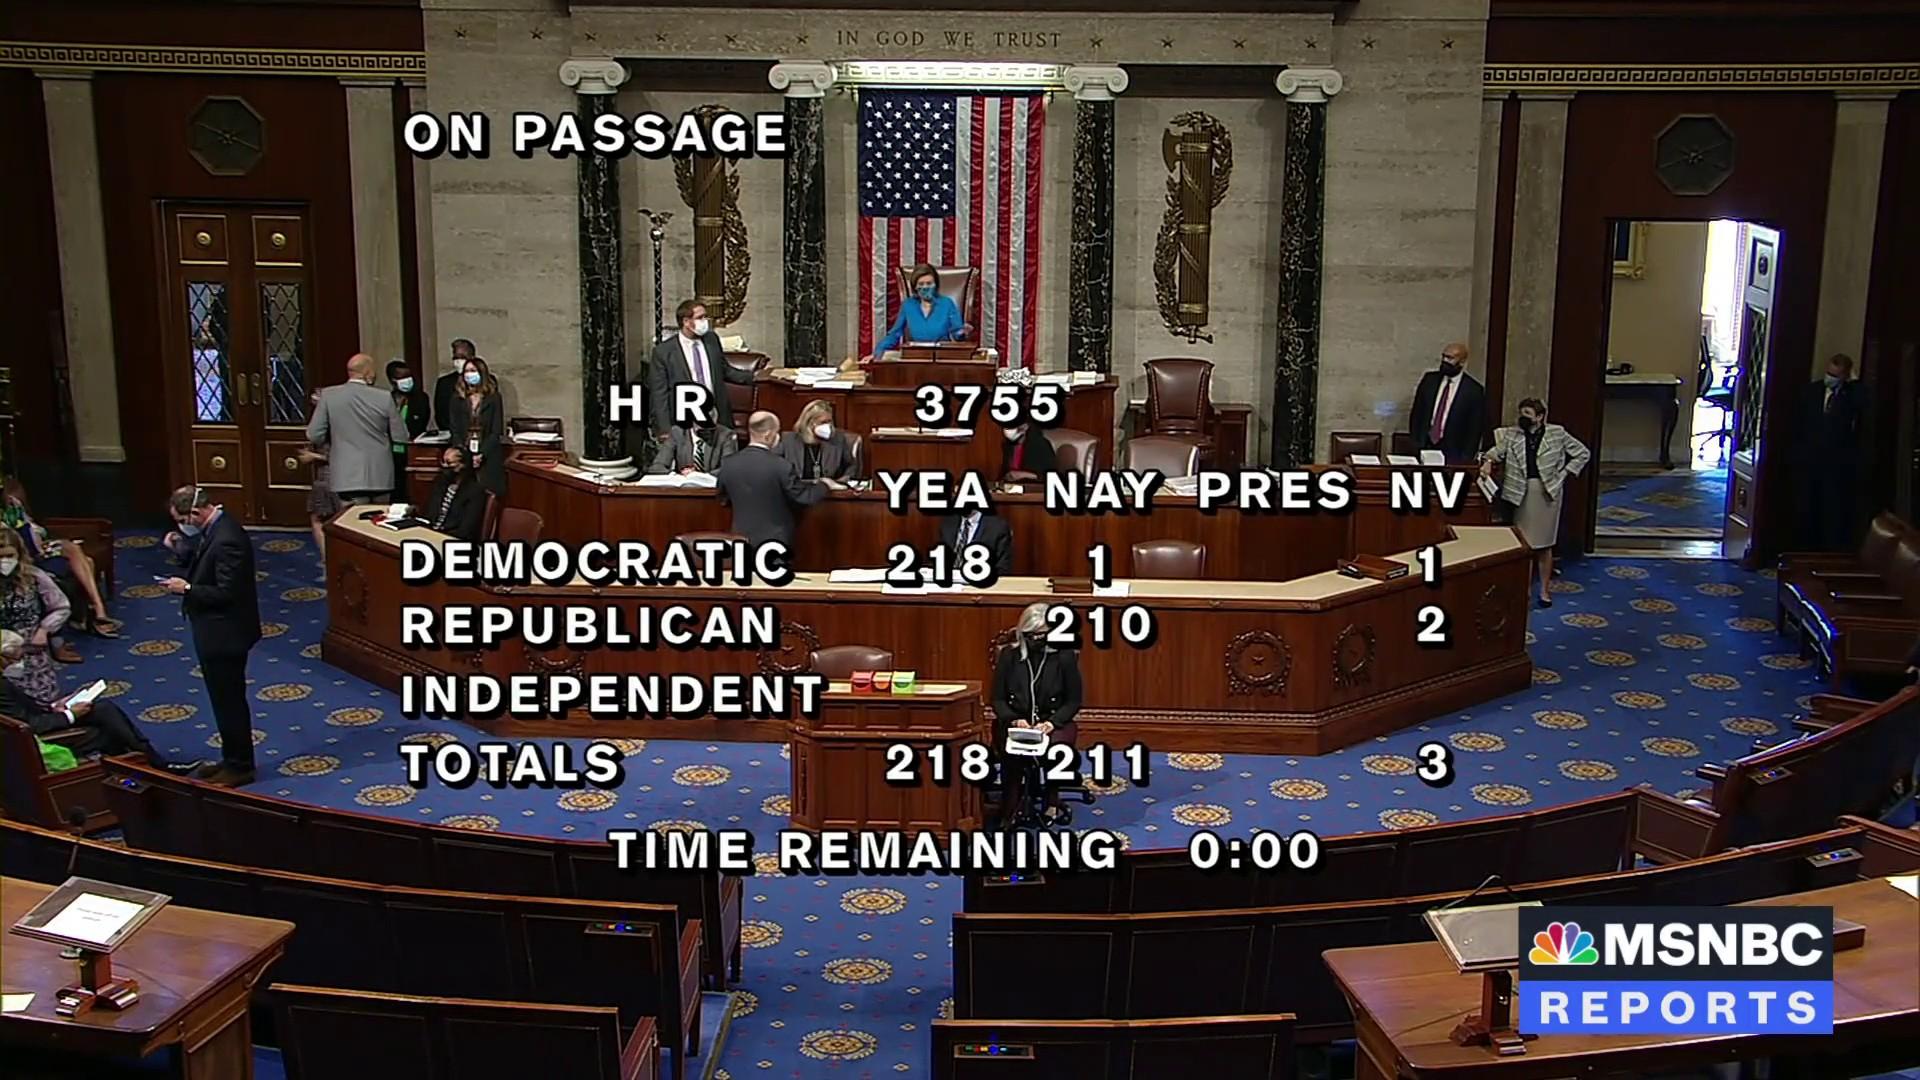 House passes bill to codify Roe v. Wade into law